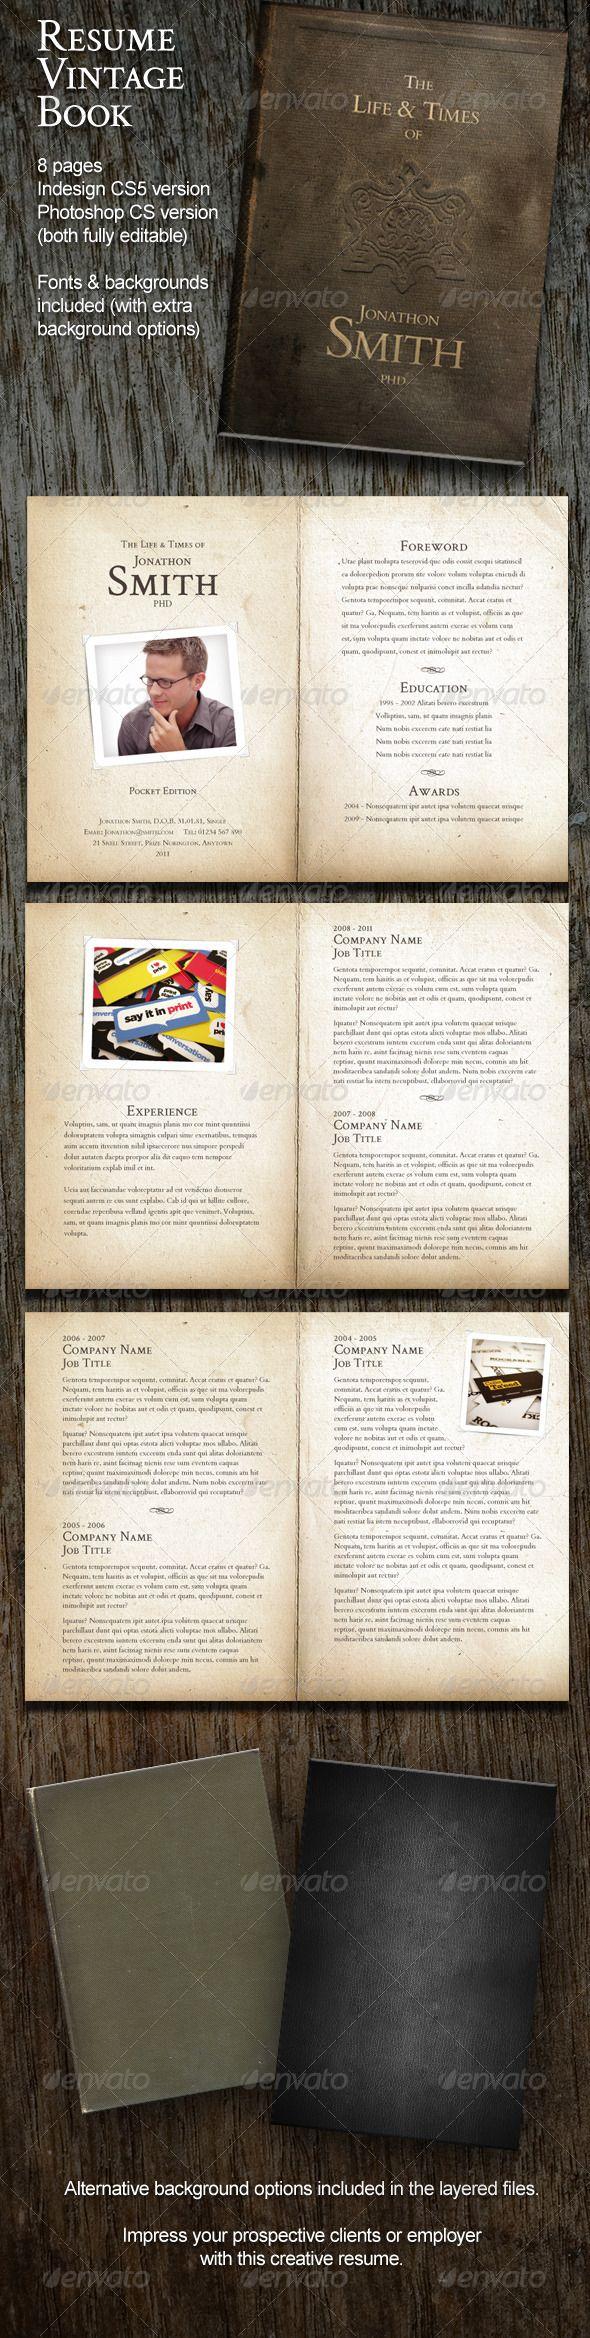 Resume Vintage Book (8 Pages)